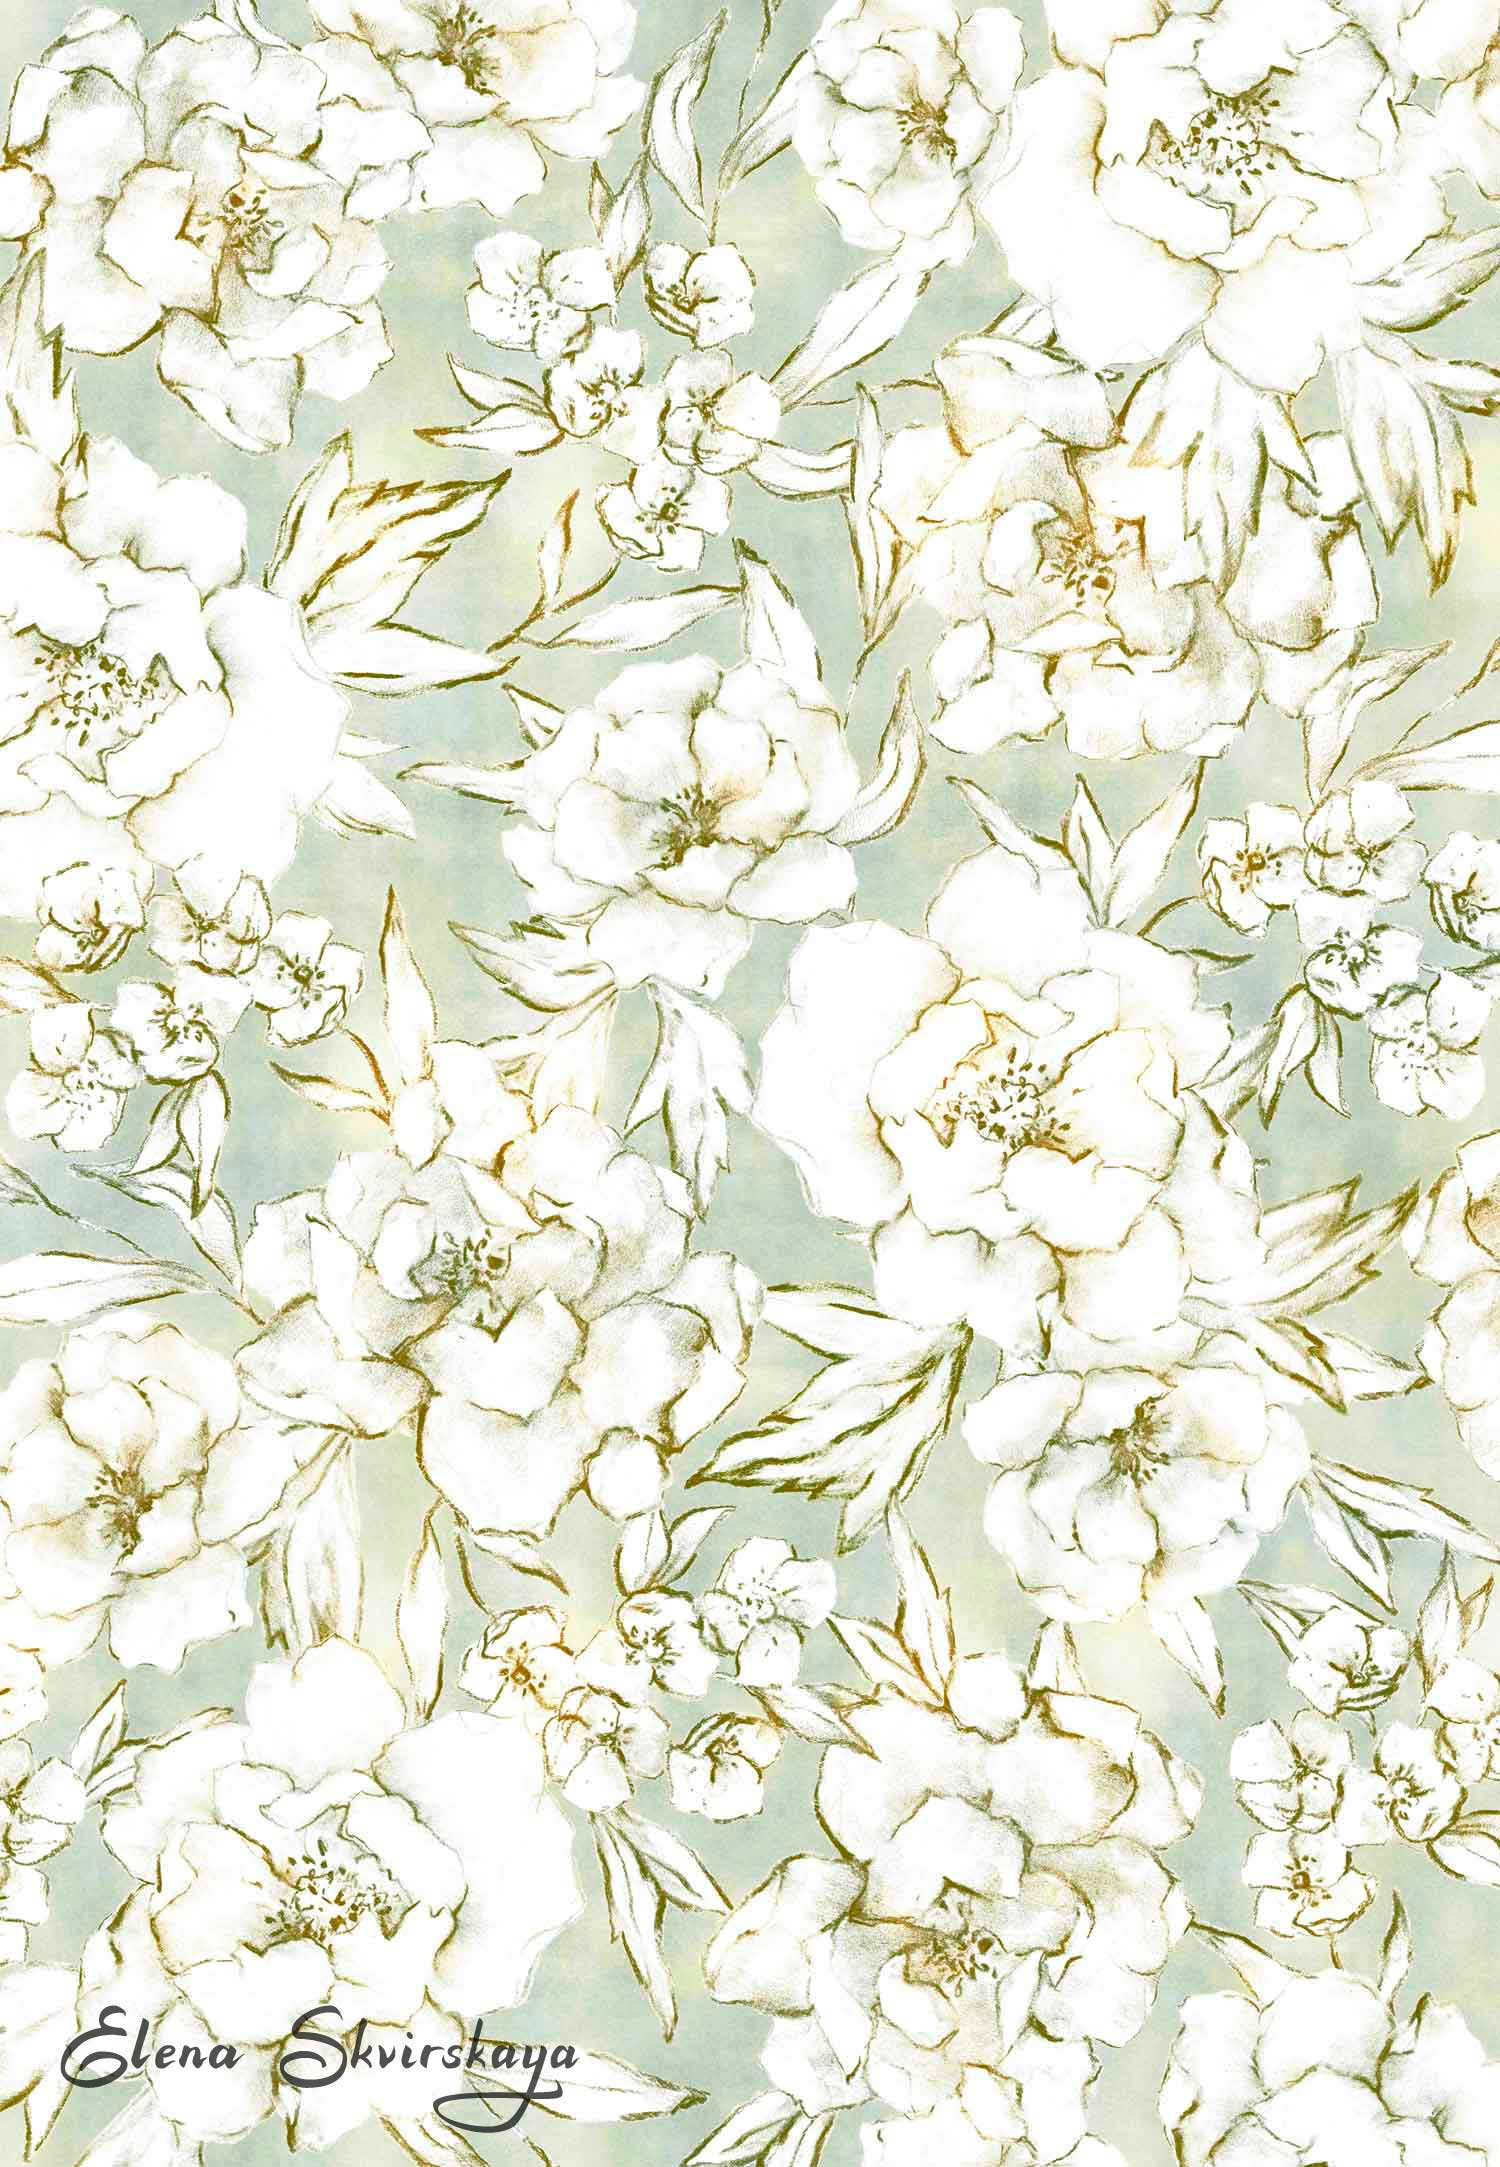 soft floral print for interior design, wallpaper, fabric